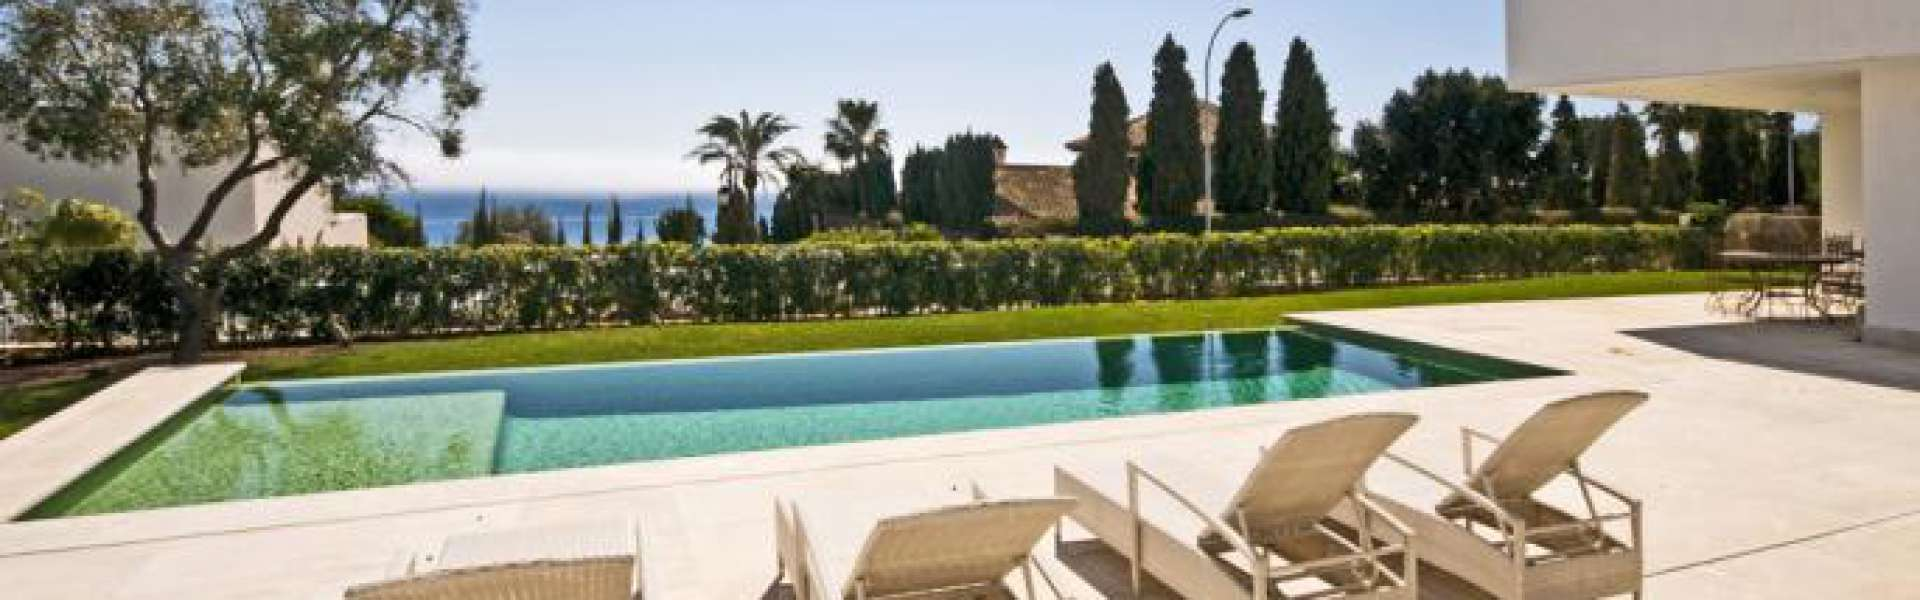 Sol de Mallorca - Modern designer villa